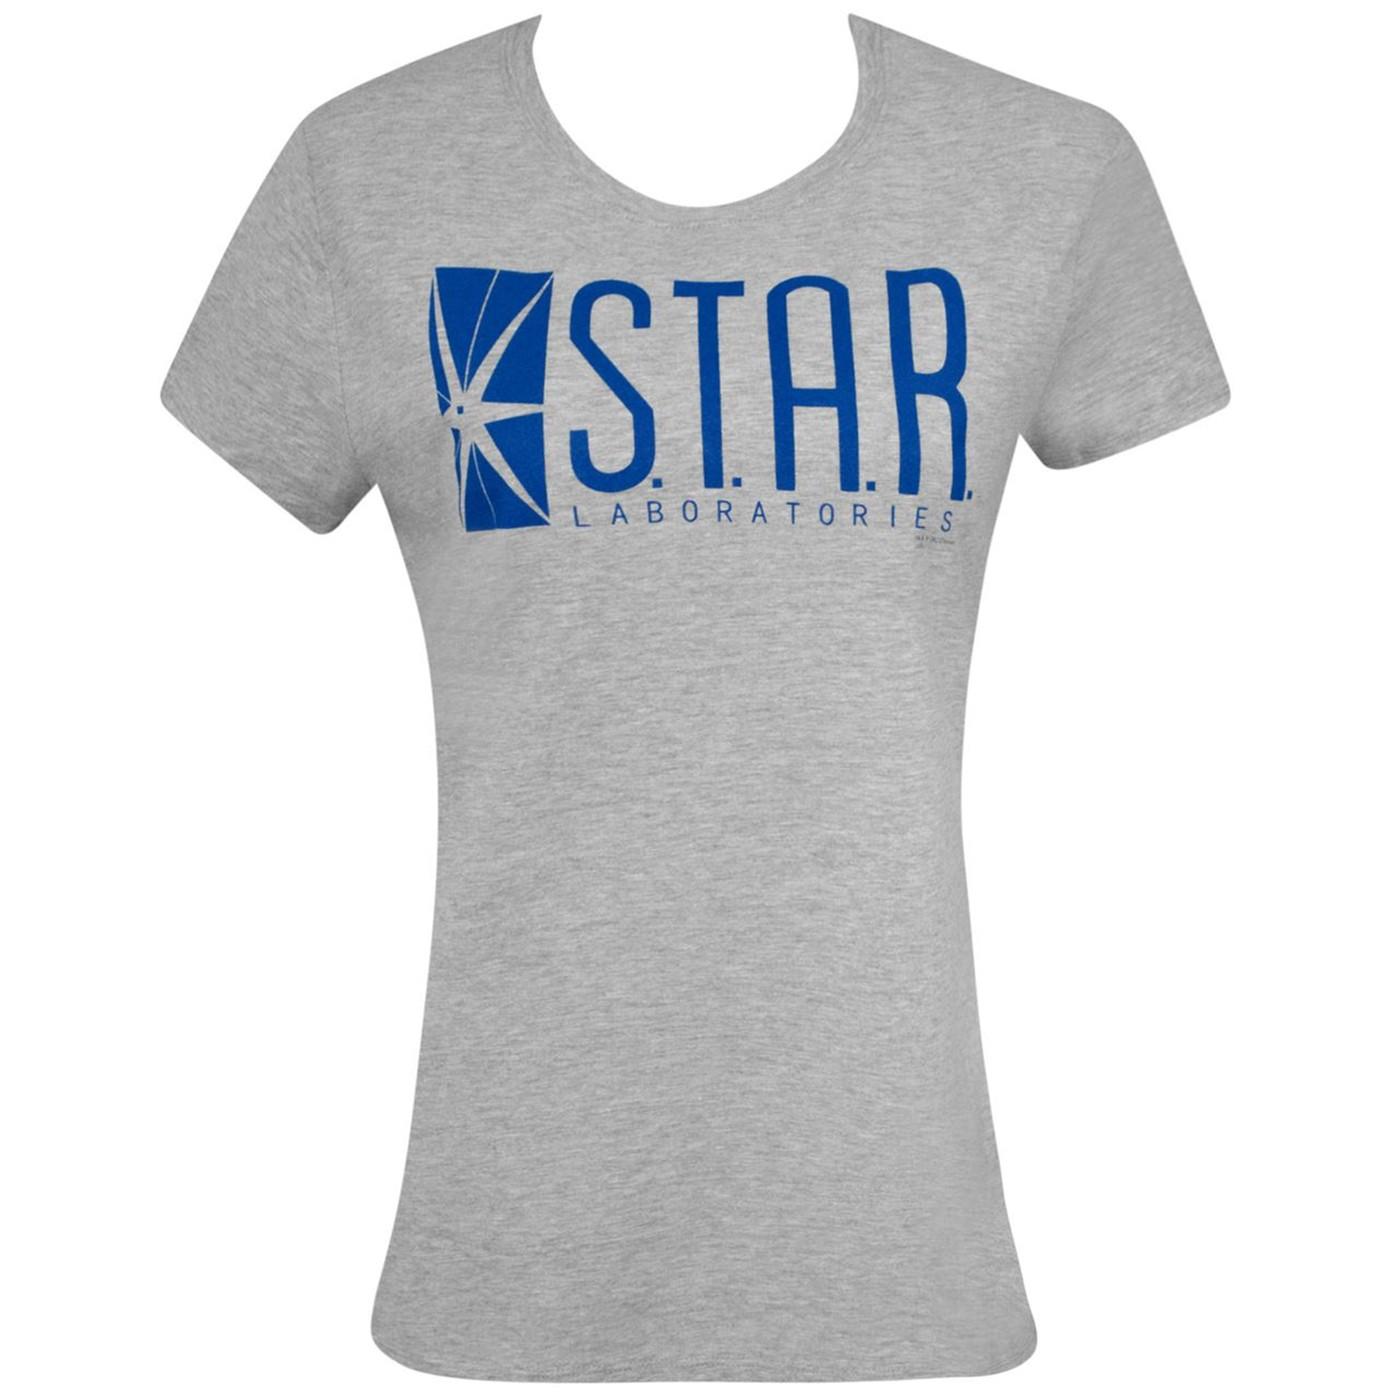 Star Laboratories Grey Women's T-Shirt